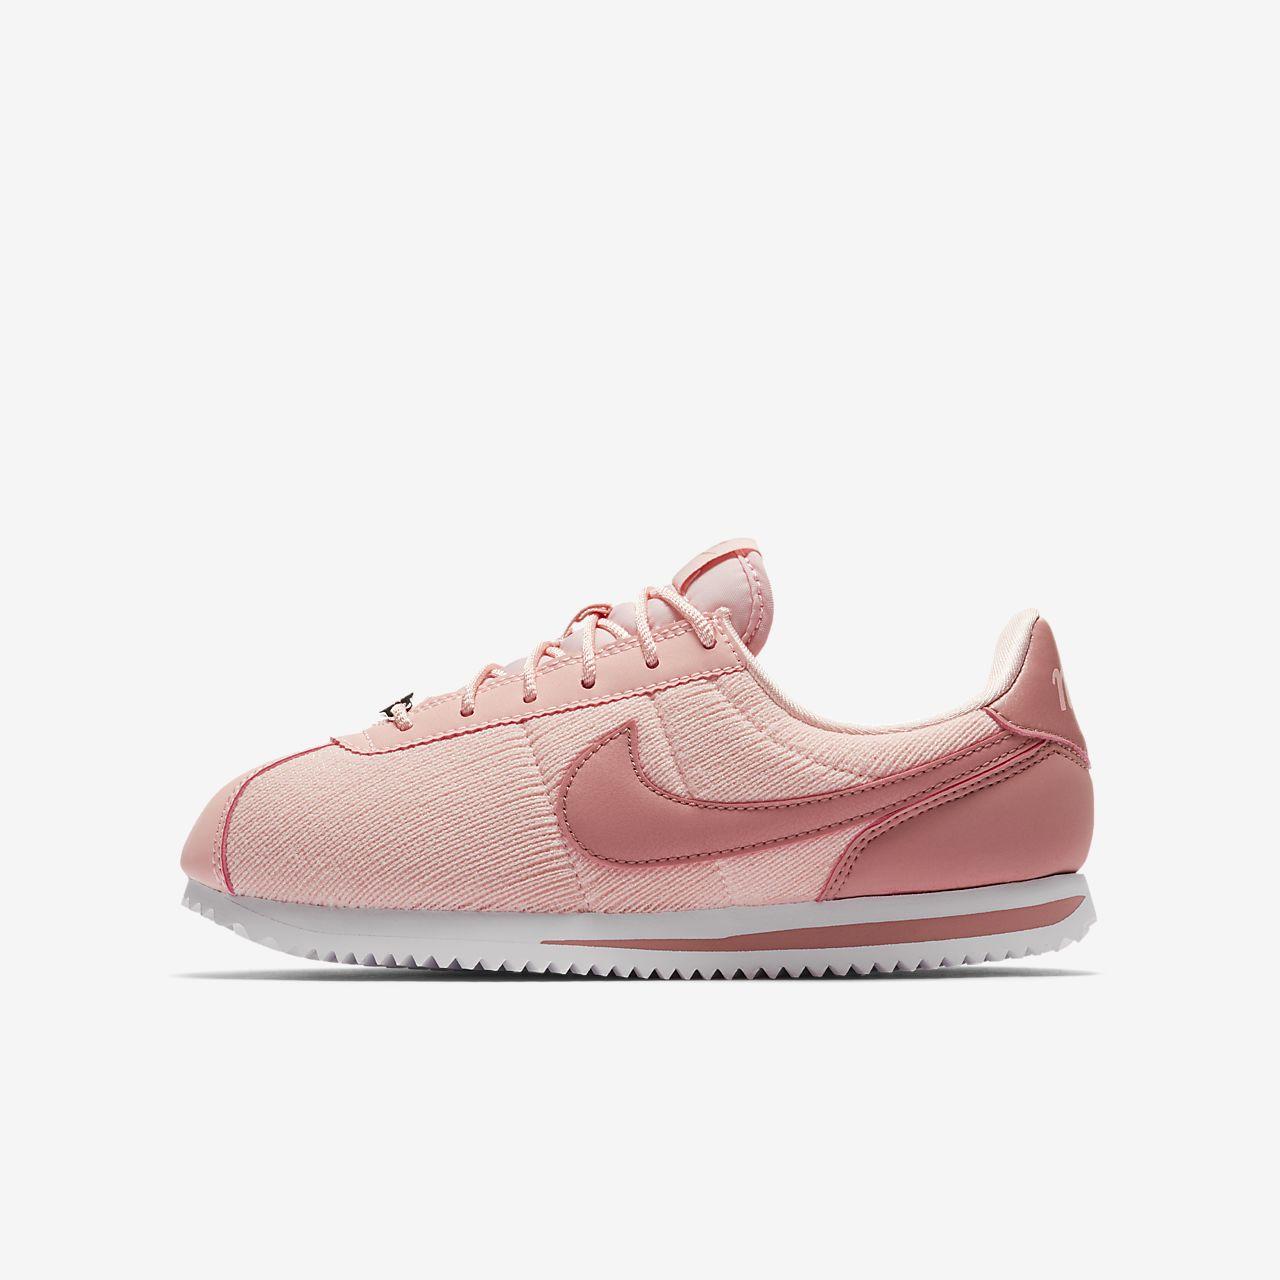 online store 491a8 85038 ... release date nike cortez basic text se sko til store børn 6e6f1 40df0